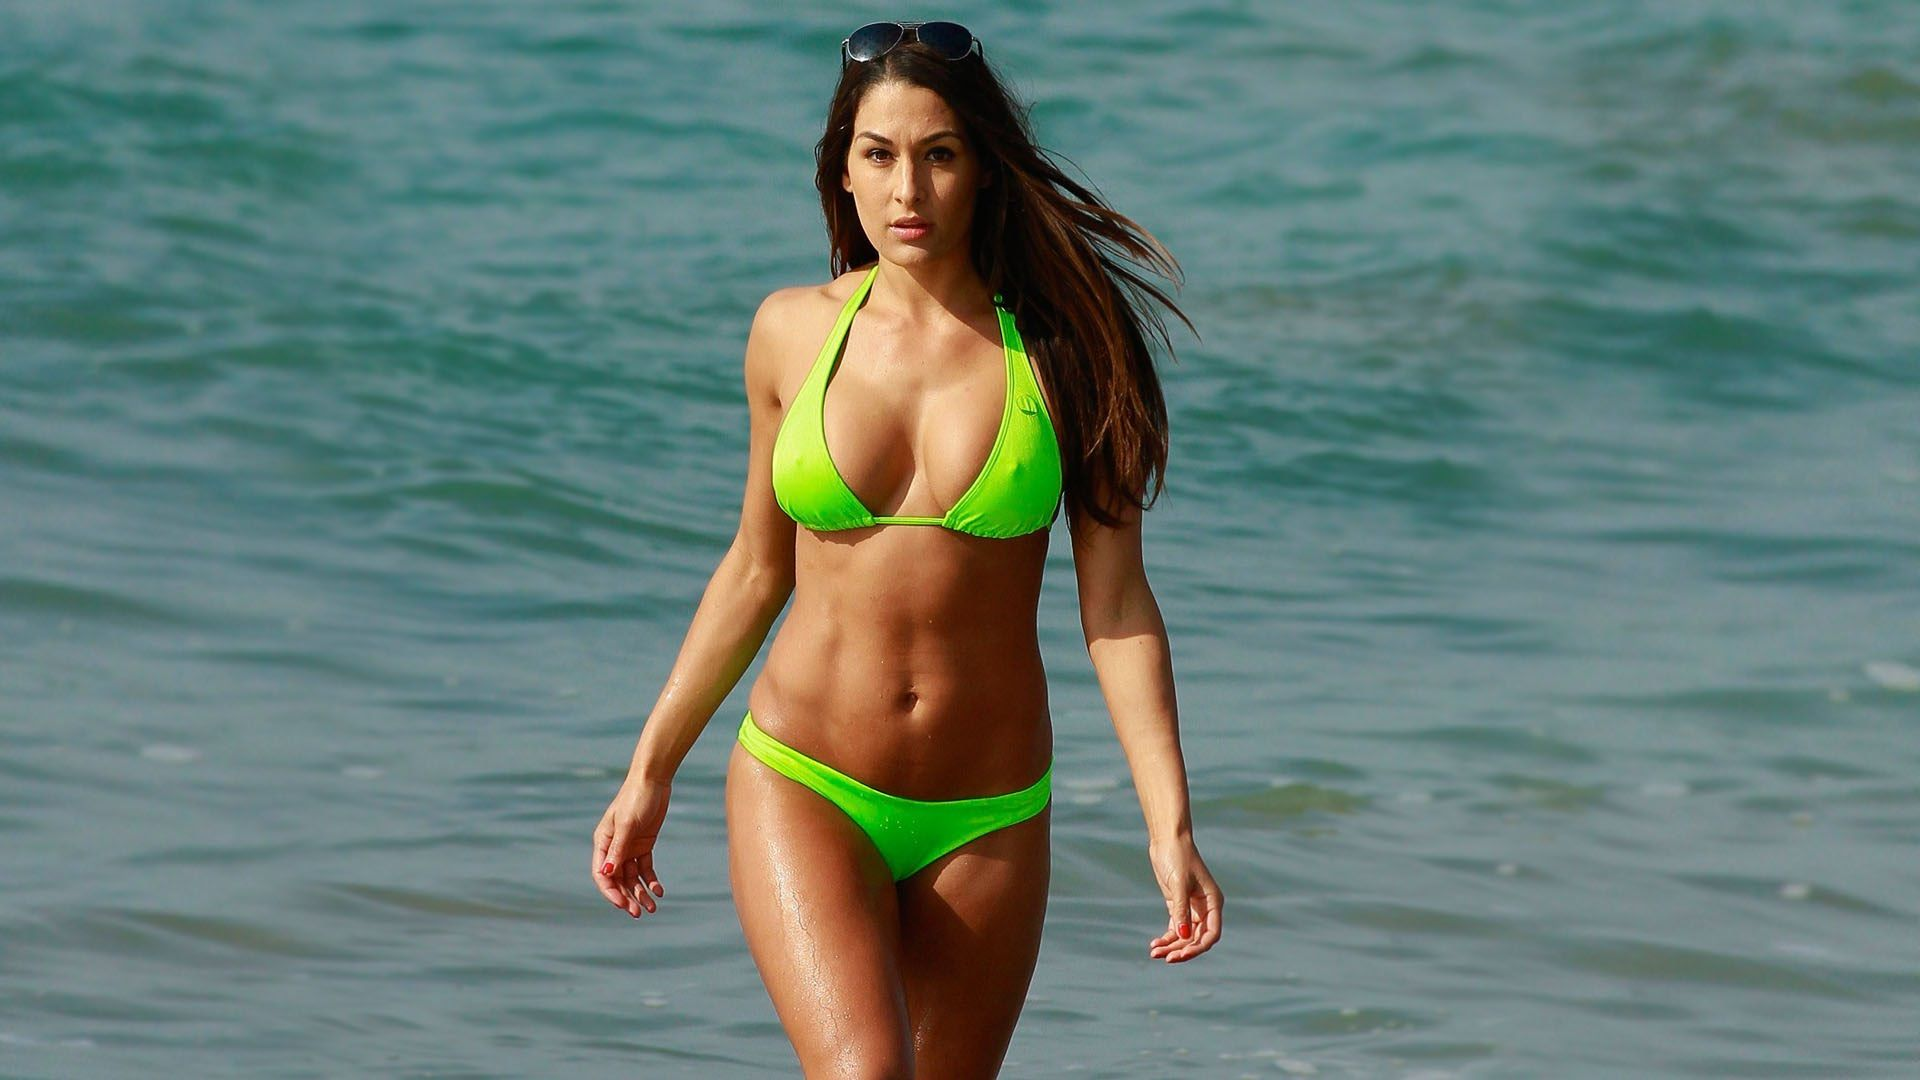 Sexy Nikki Bella In Bikini Wallpaper Download In 4K  Aaa -9803